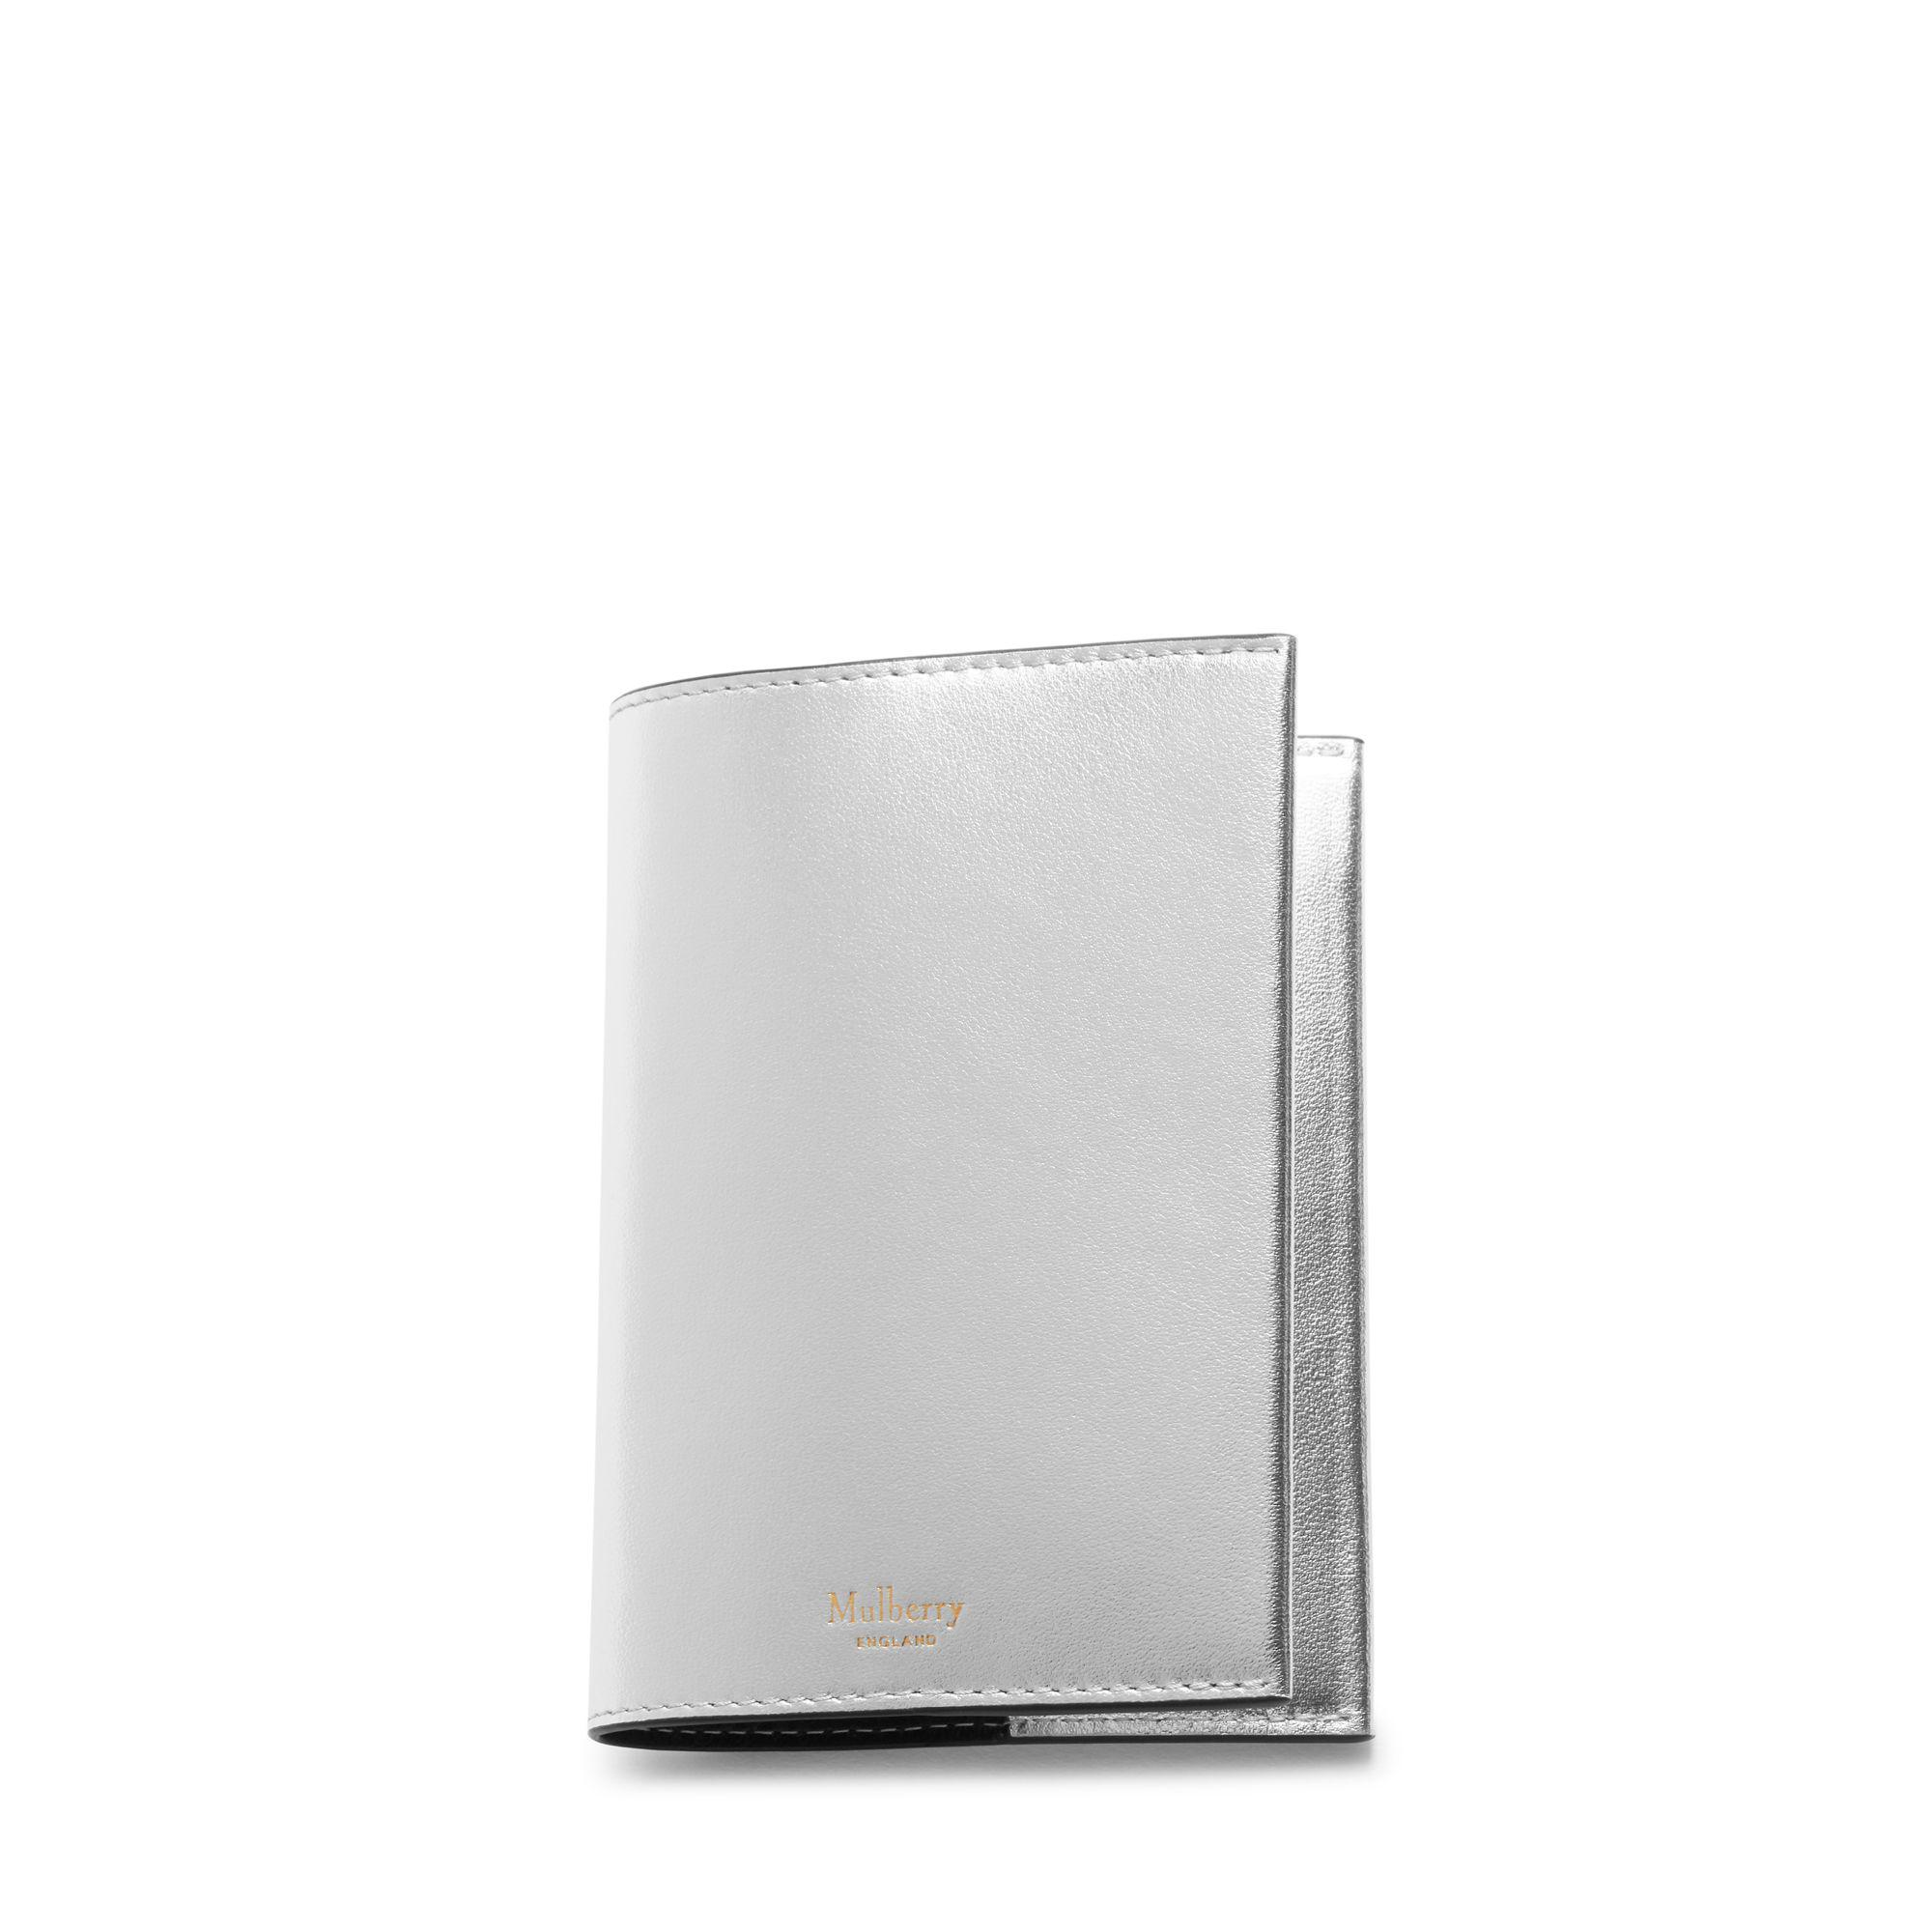 5f87b74e10c1 Mulberry - Passport Cover In Light Silver Metallic Nappa - Lyst. View  fullscreen